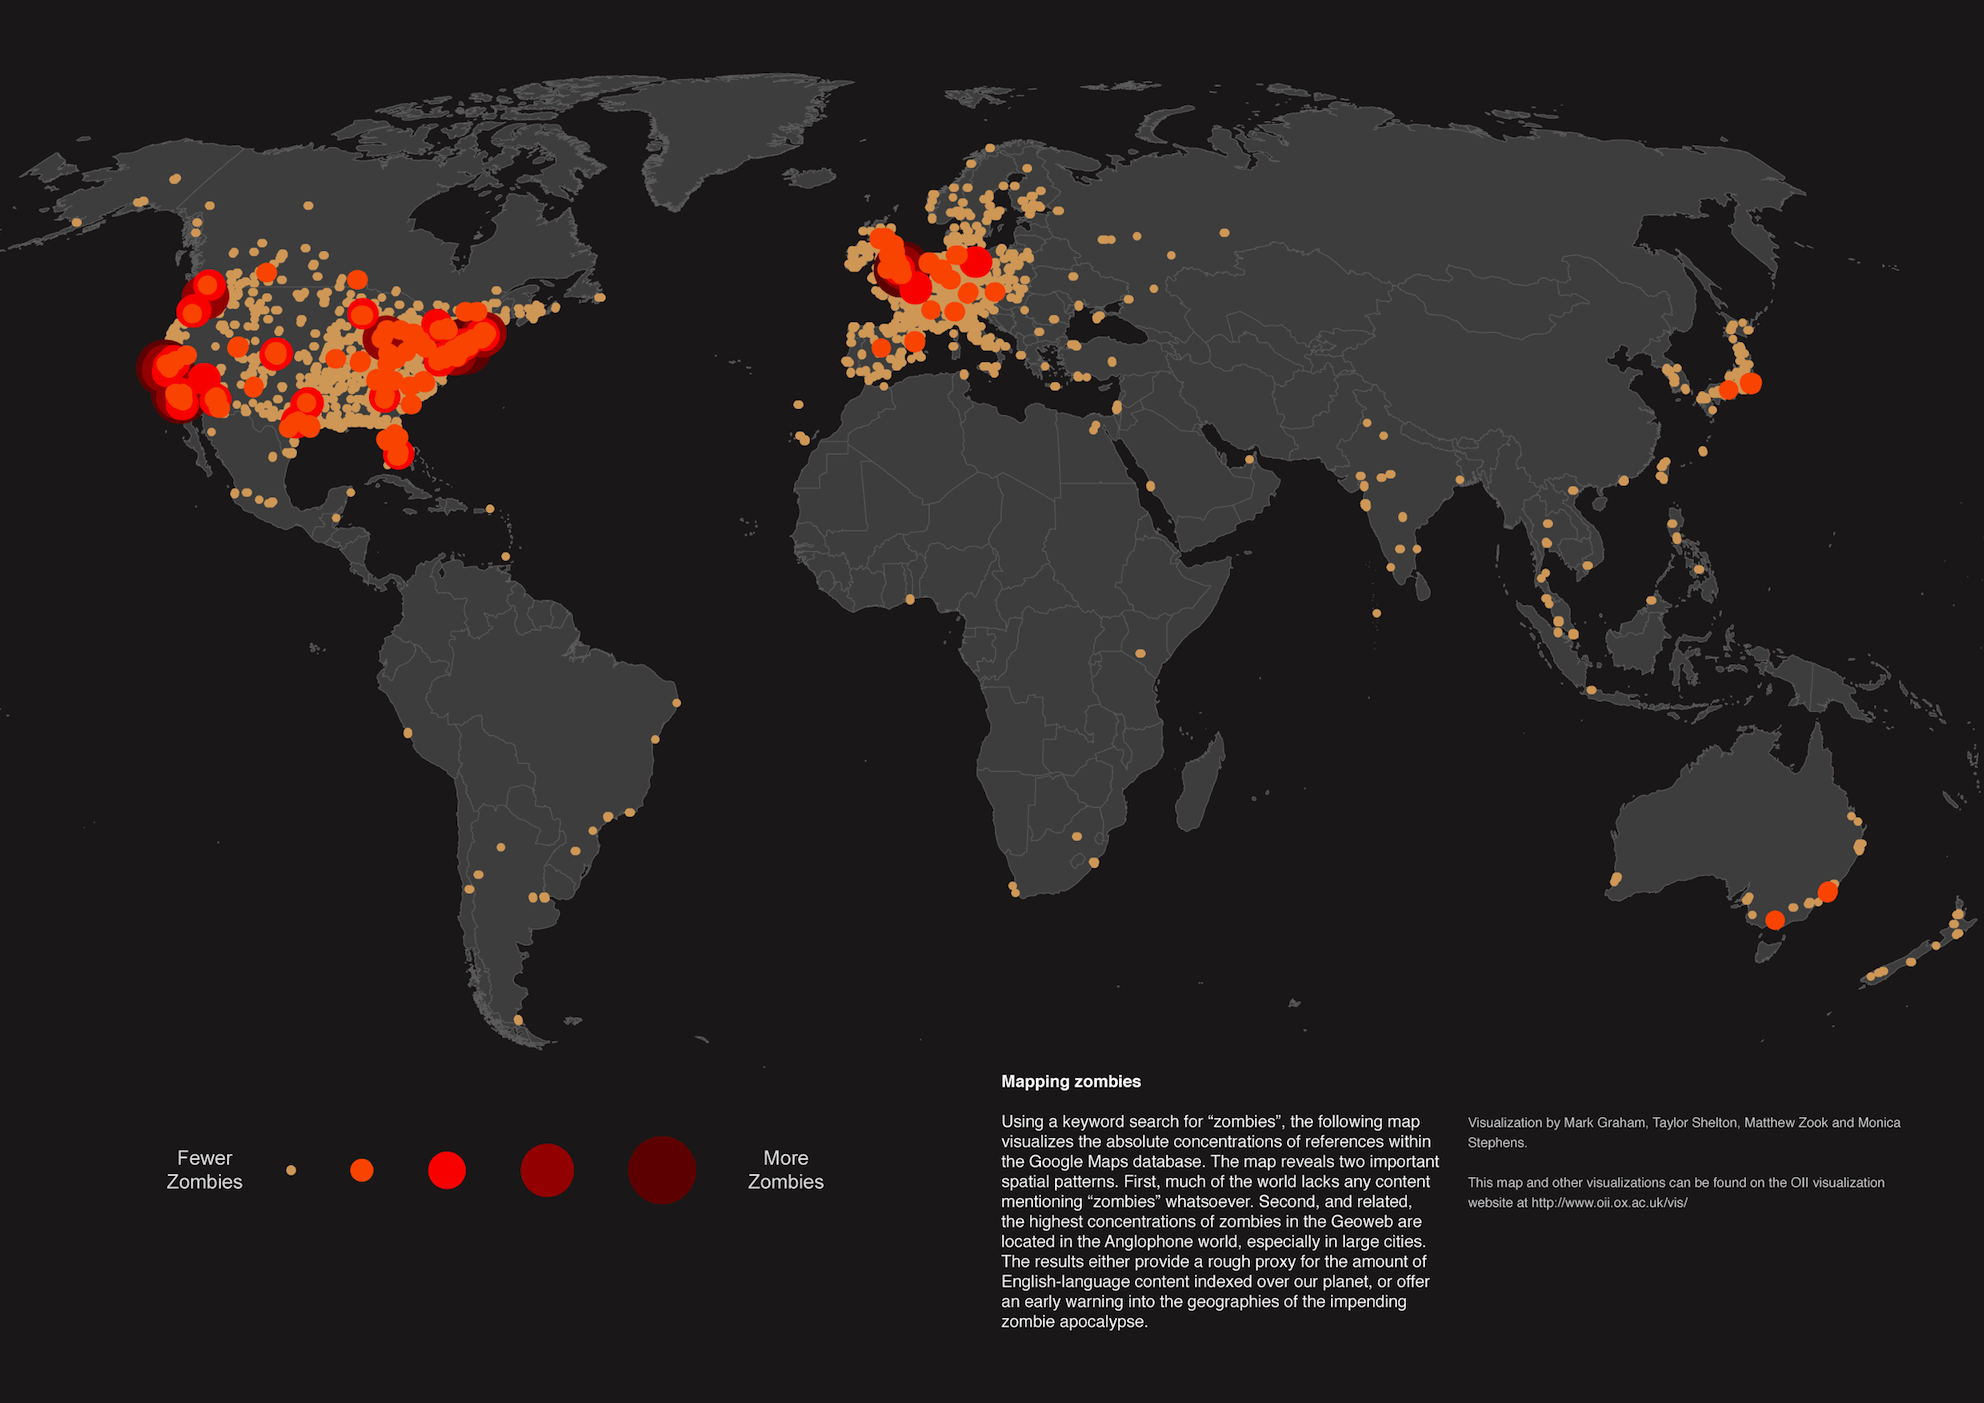 Mapa de Zumbis